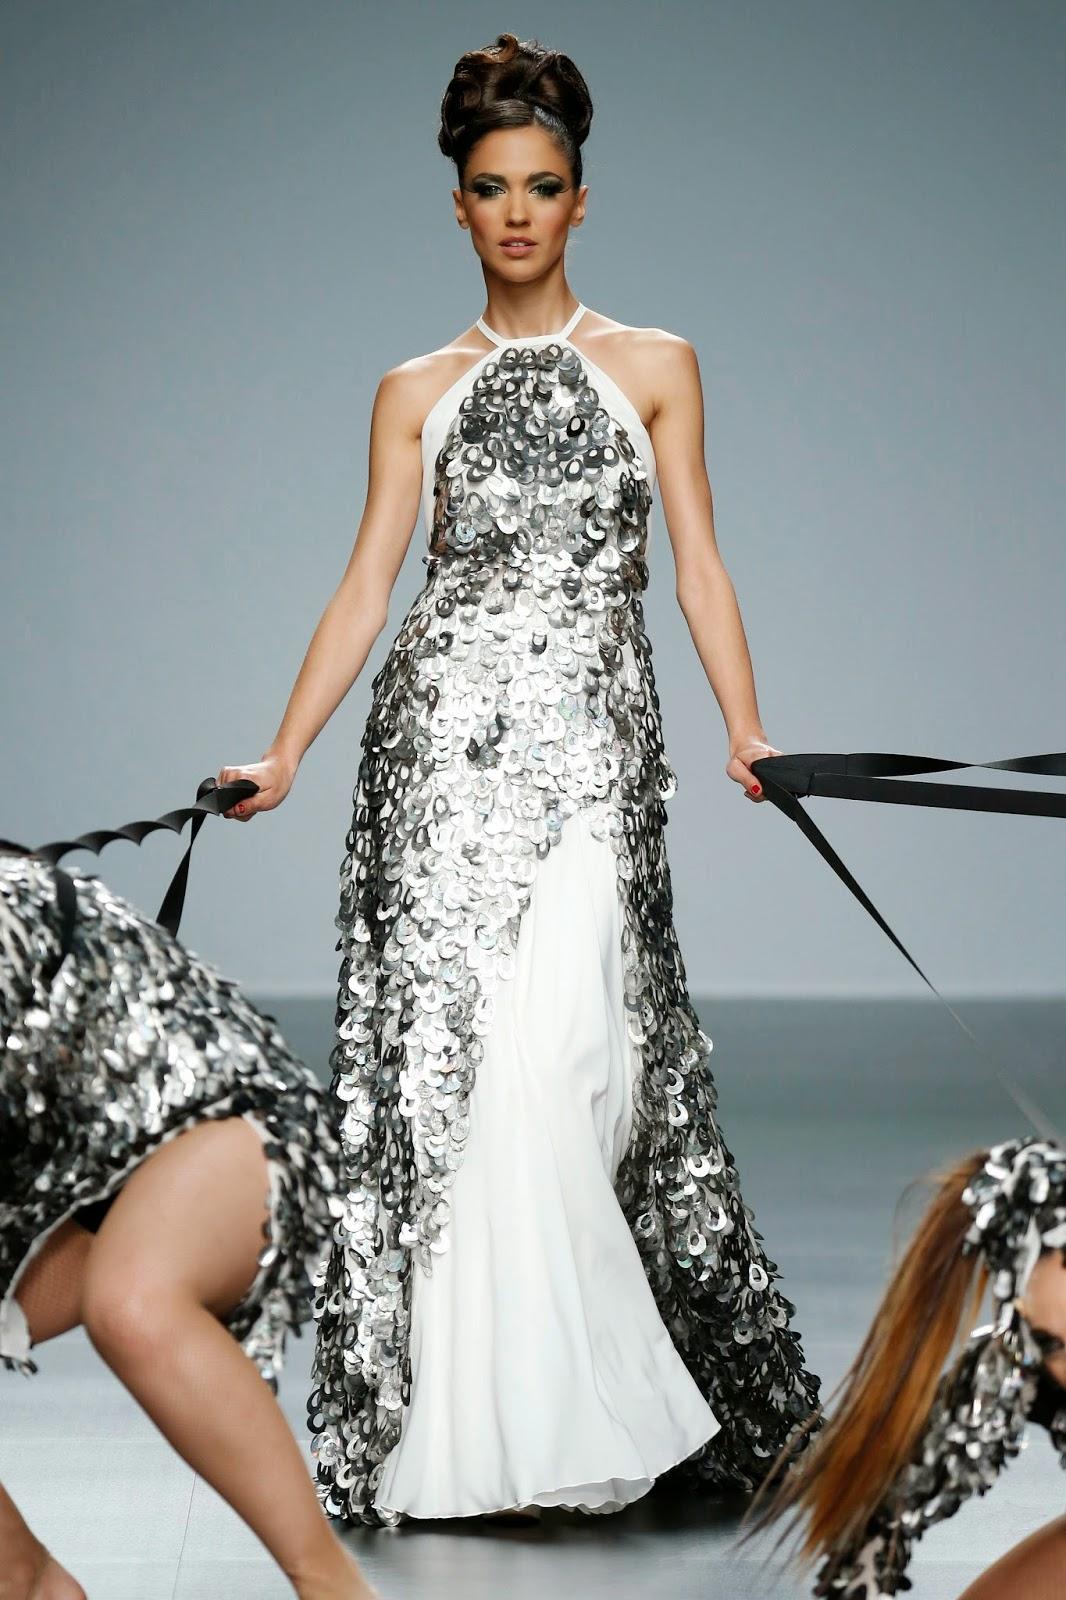 Hechizo\' by Jordi Dalmau #BBW2016 - Quiero una boda perfecta